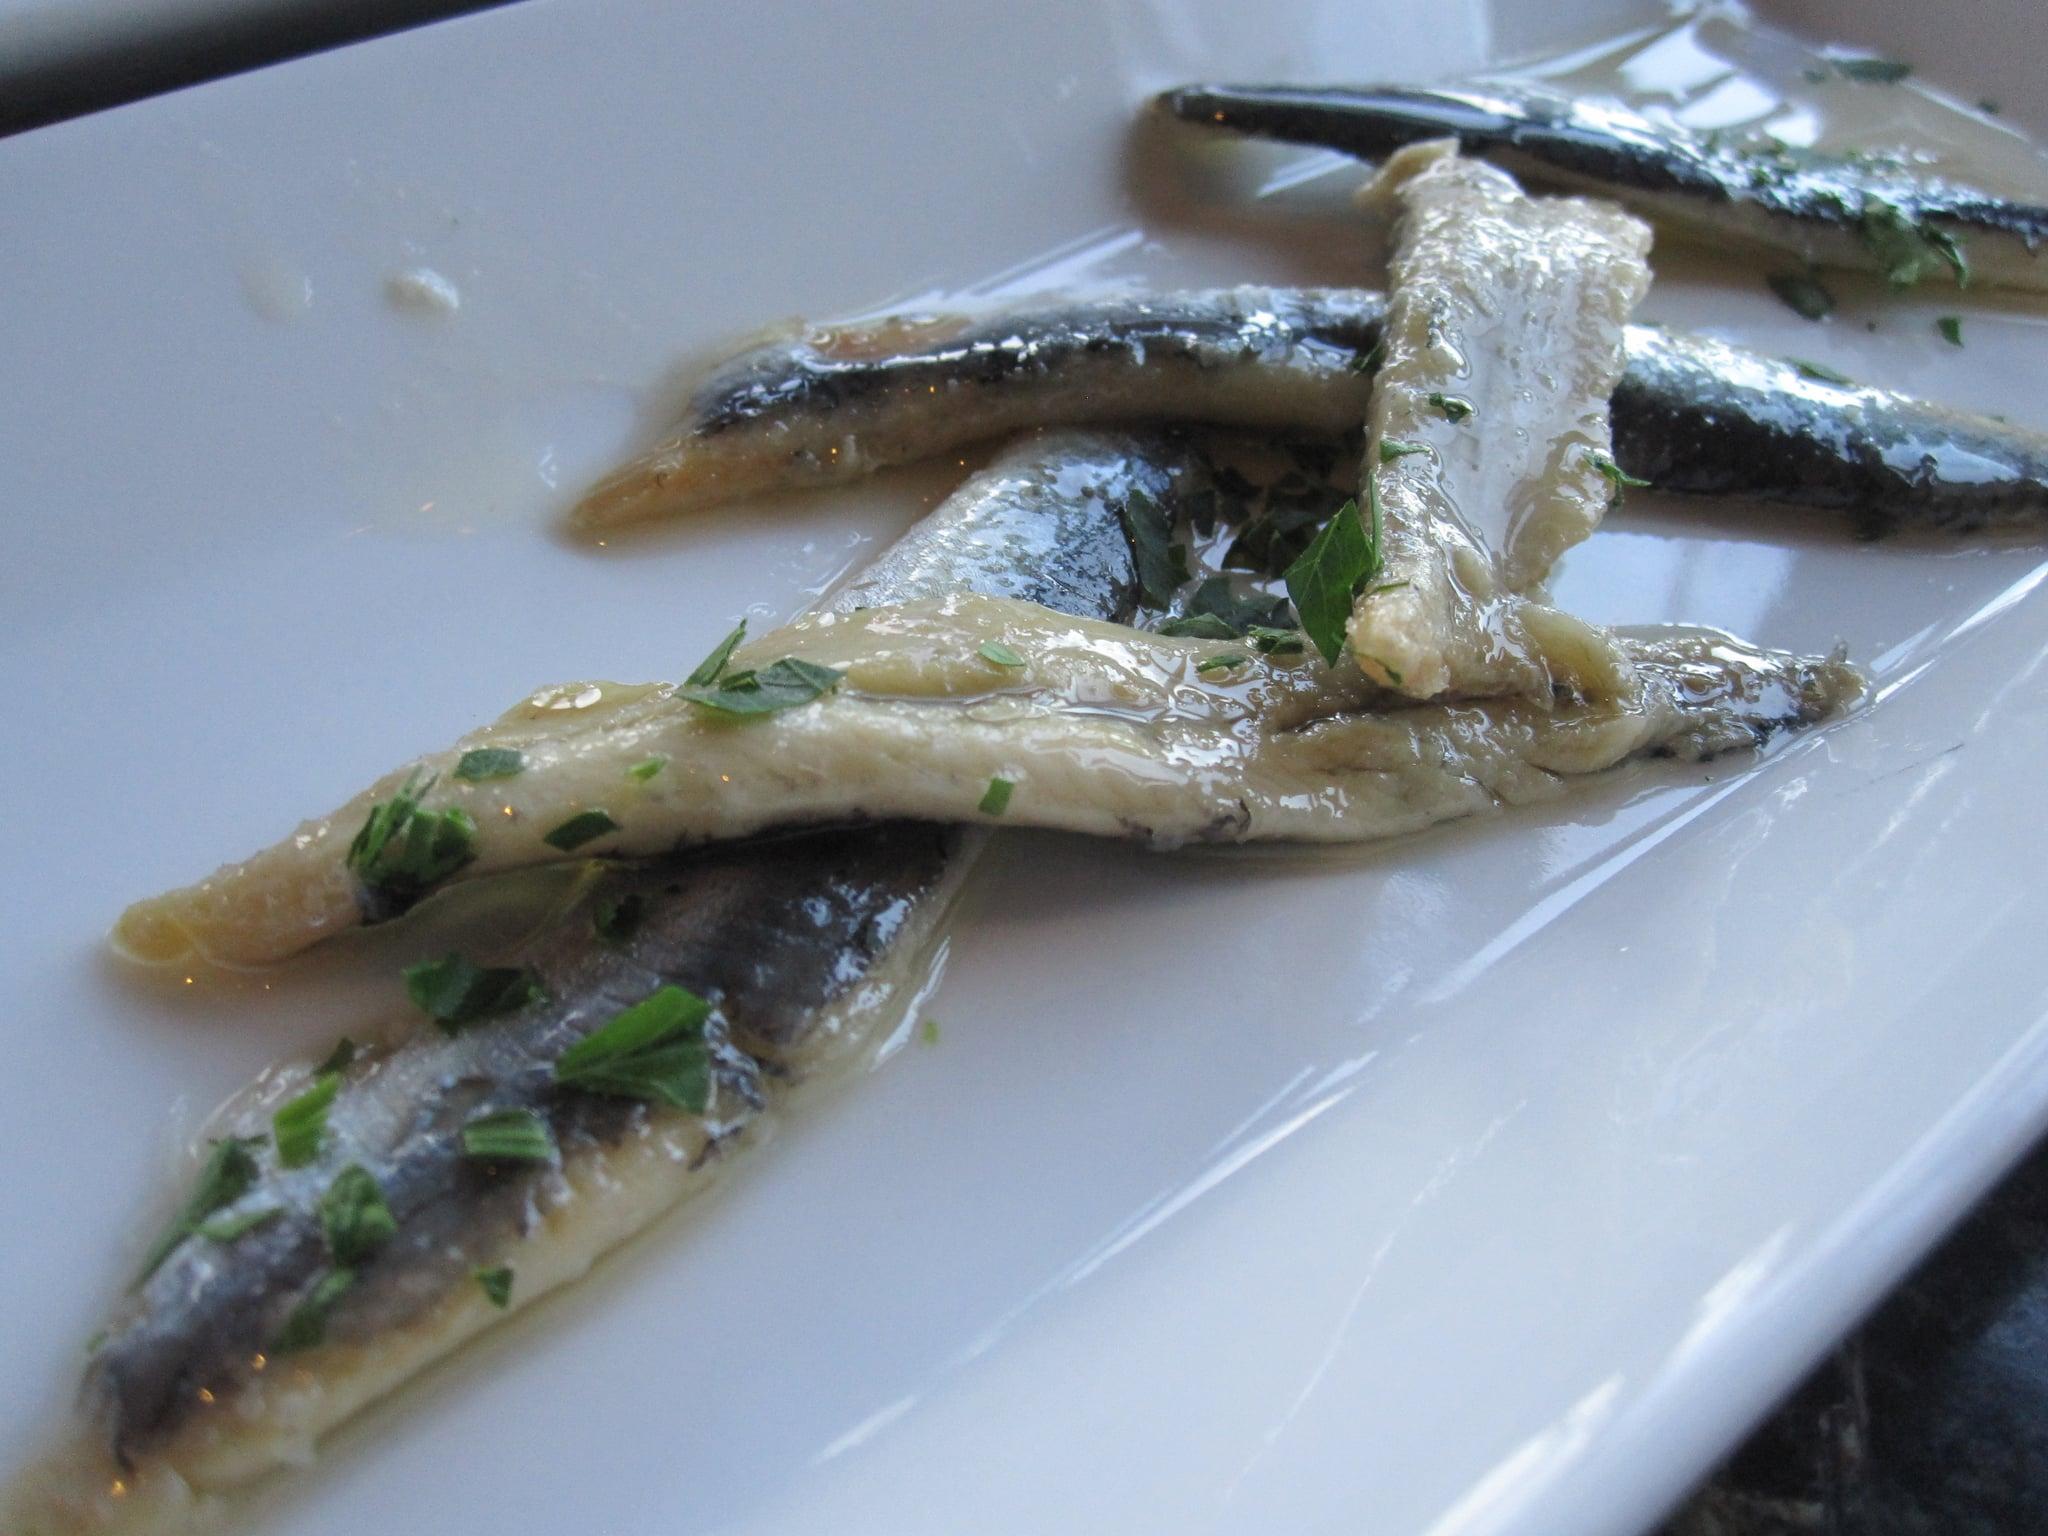 The Spanish boquerones were amazing. Stay tuned for the recipe!